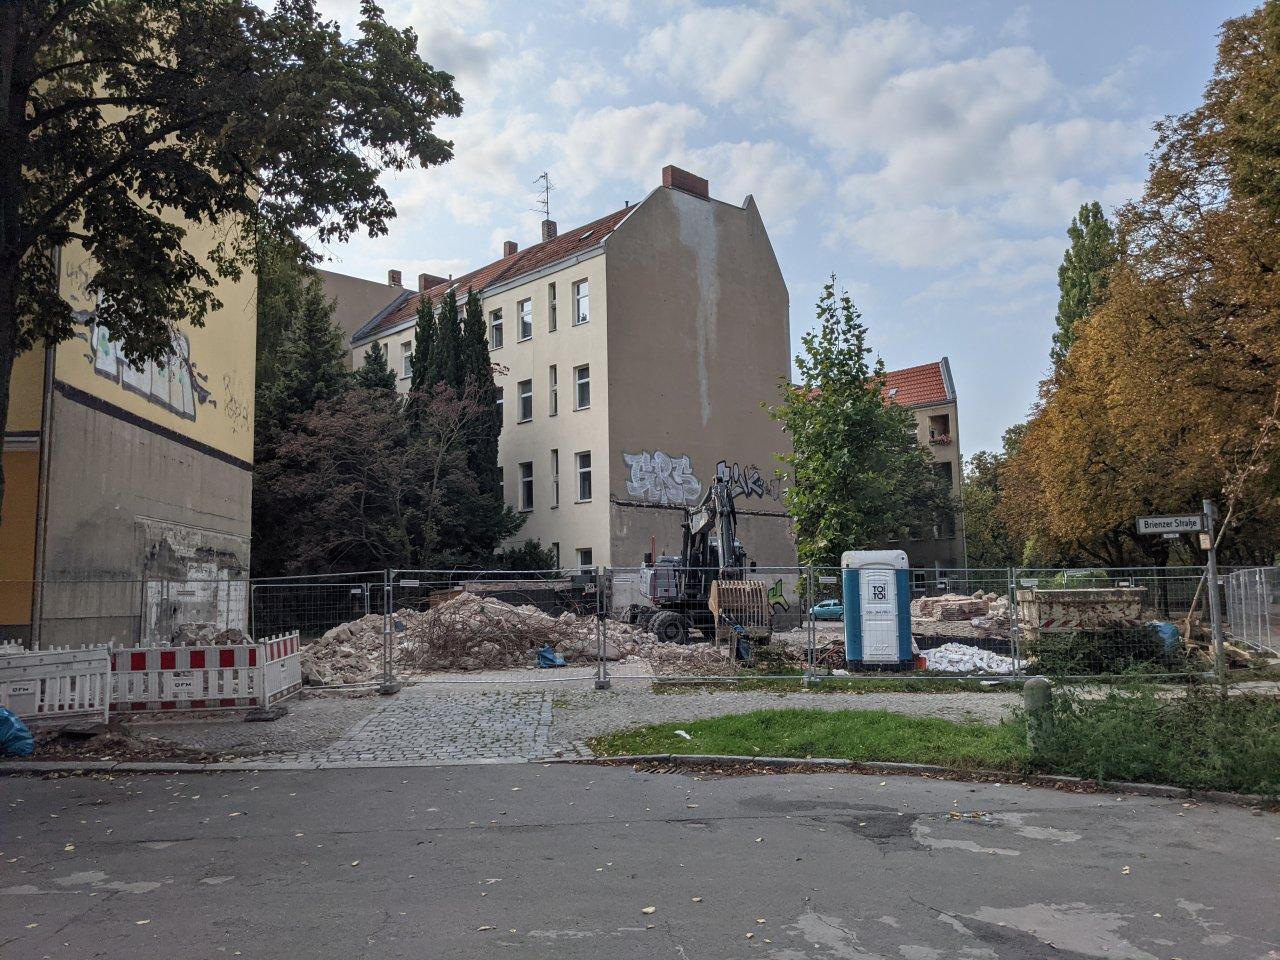 Neubauprojekt-Reinickendorf-Schaefersee.jpg